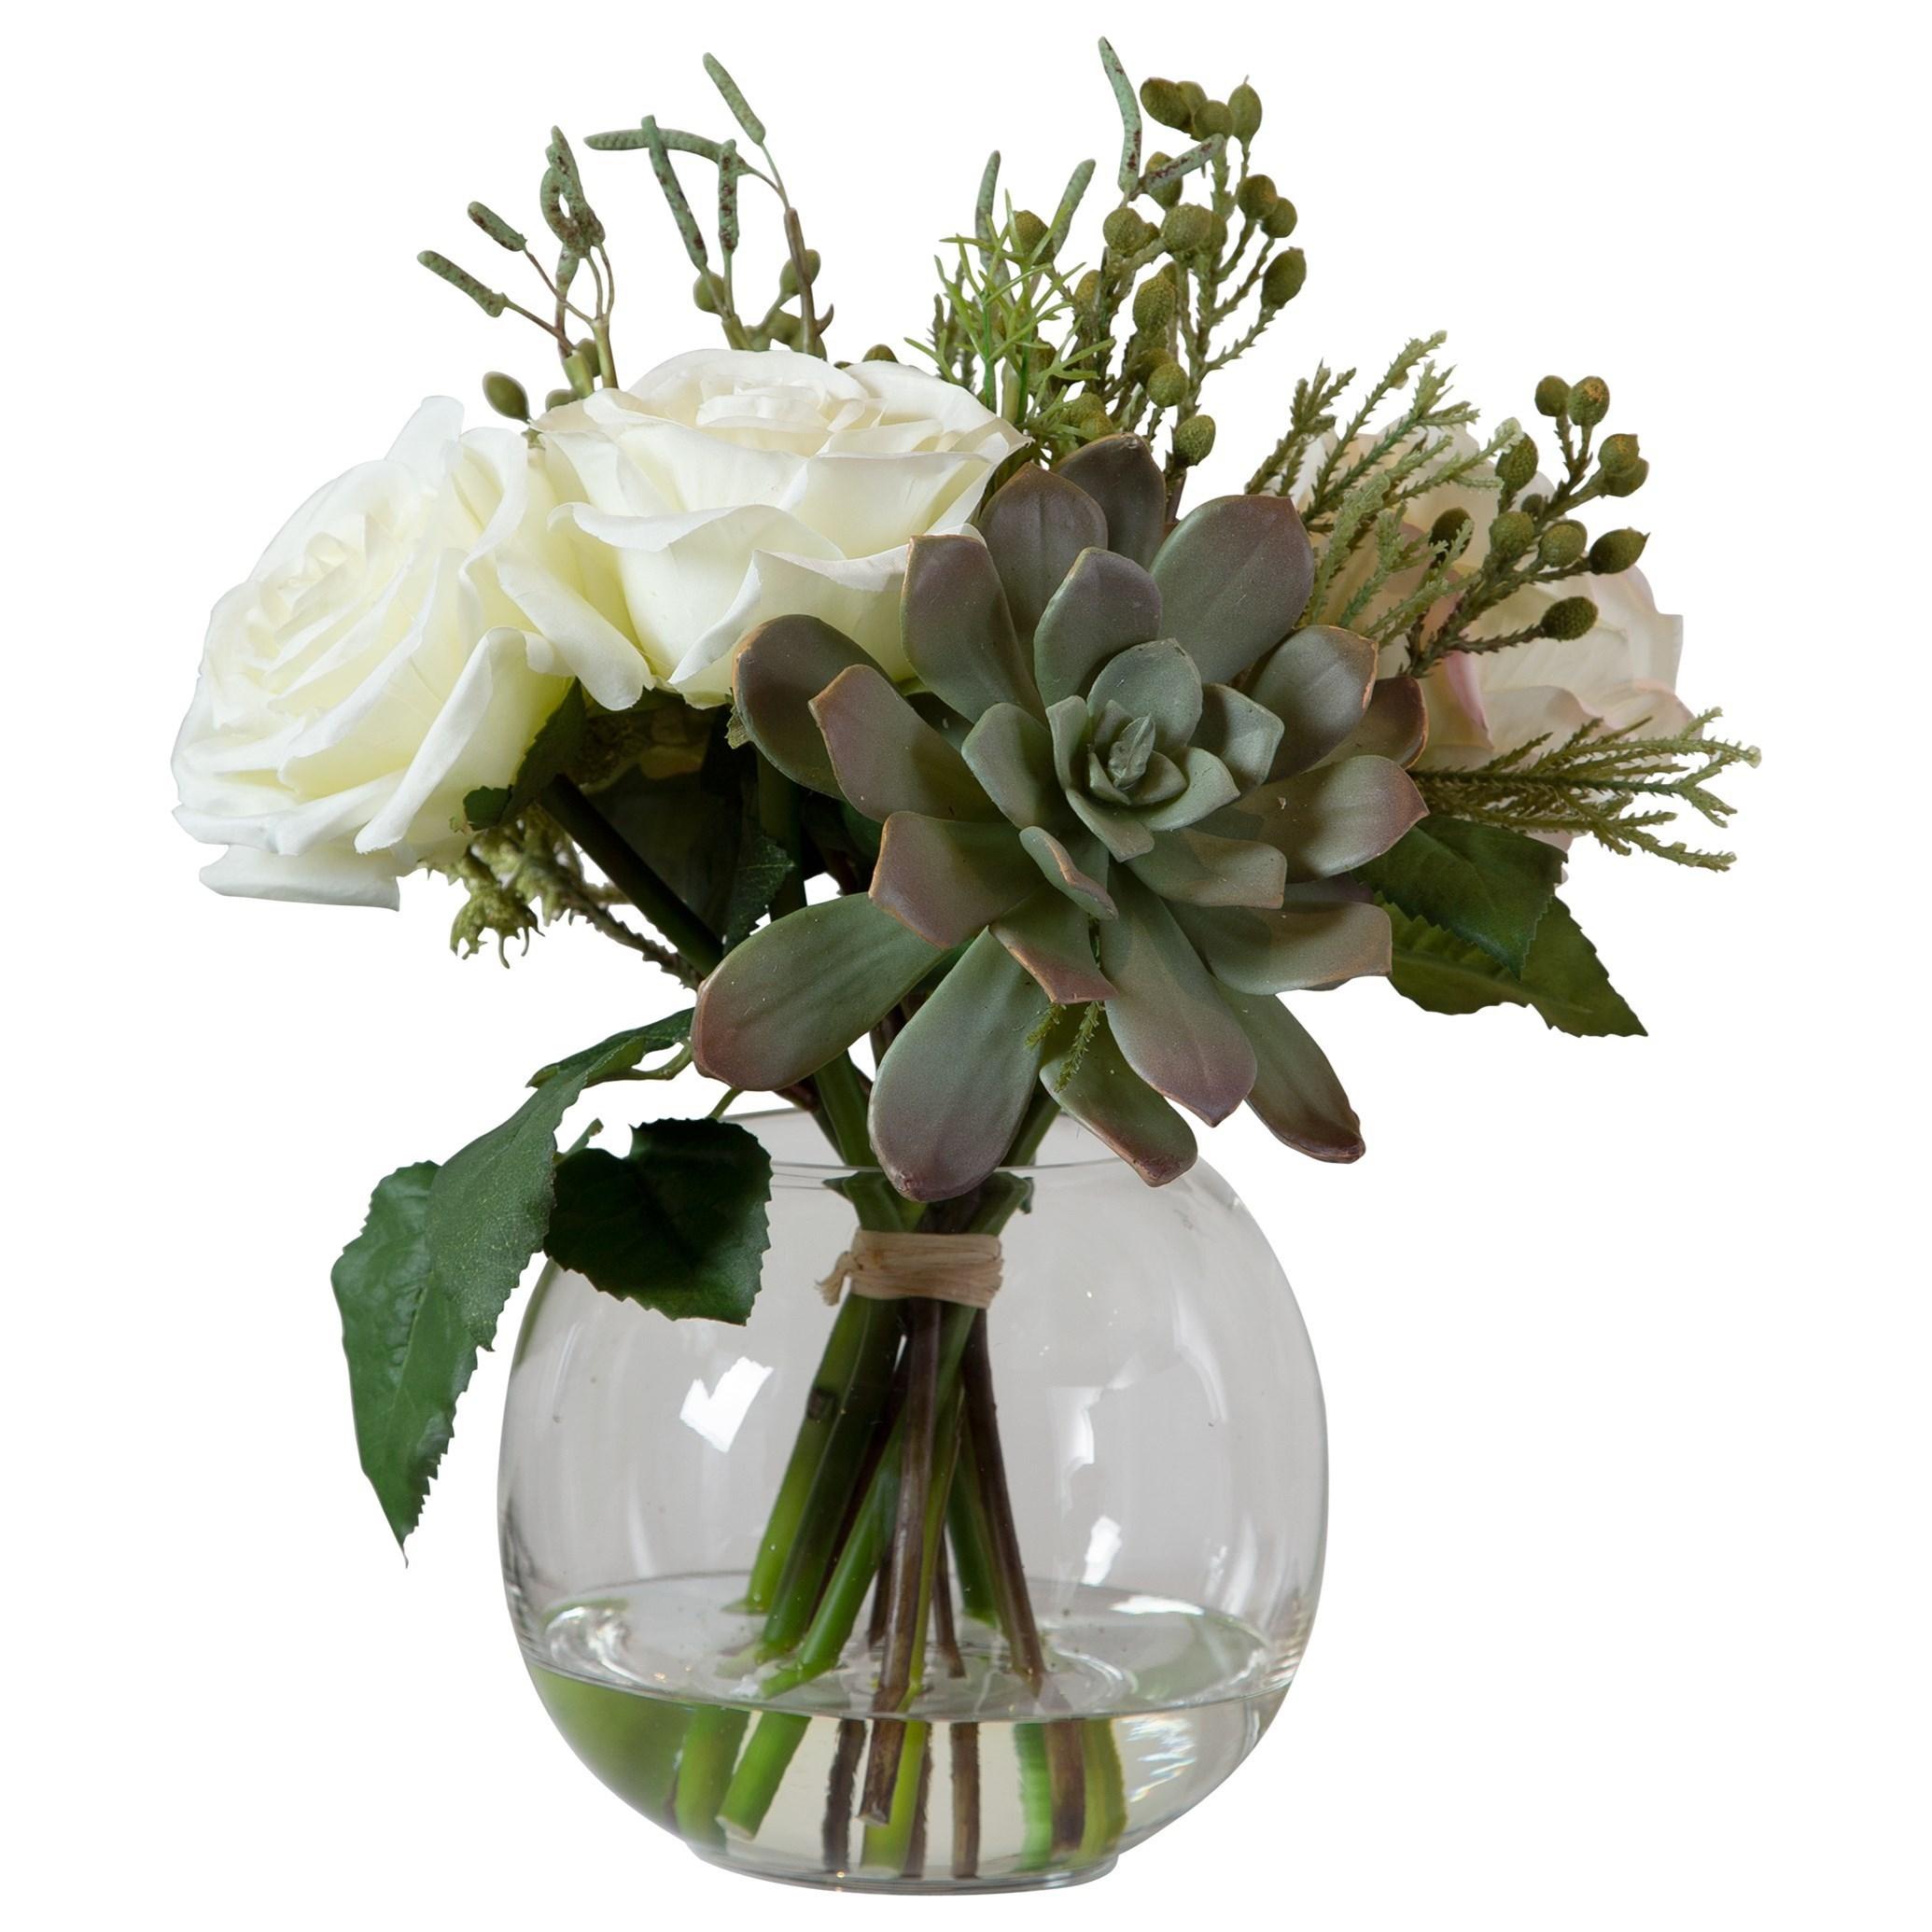 Accessories Belmonte Floral Bouquet & Vase by Uttermost at Dunk & Bright Furniture